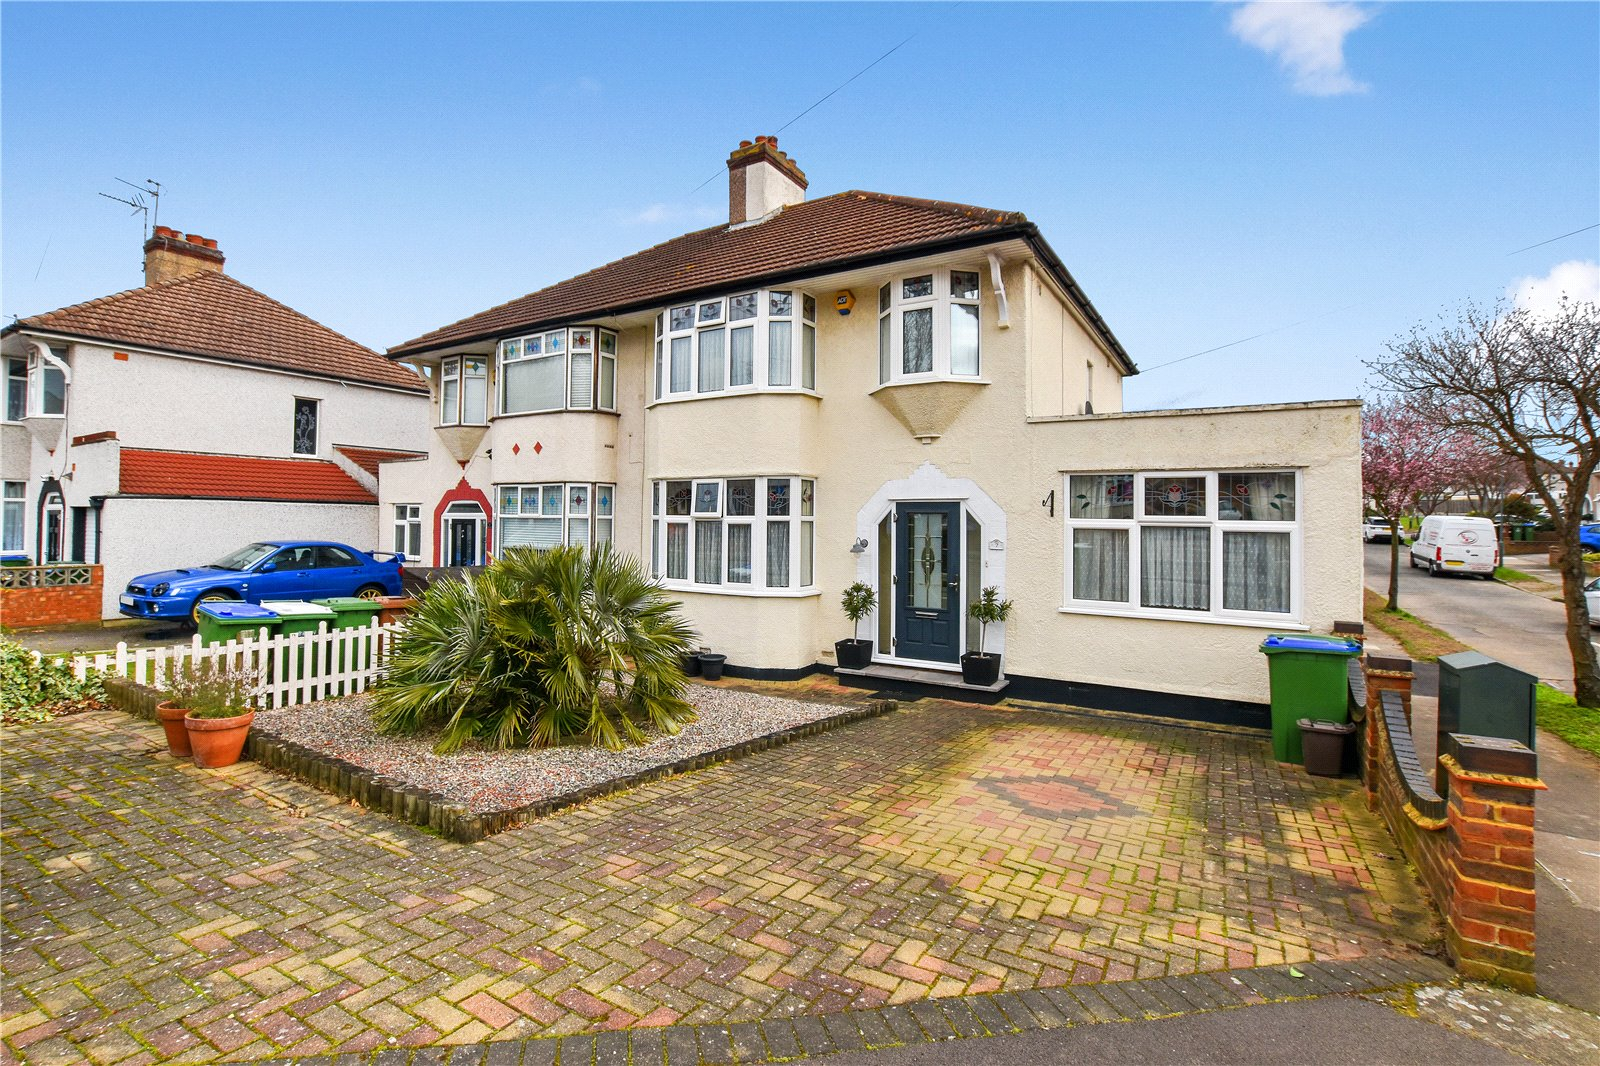 Hollingbourne Avenue, Bexleyheath, Kent, DA7